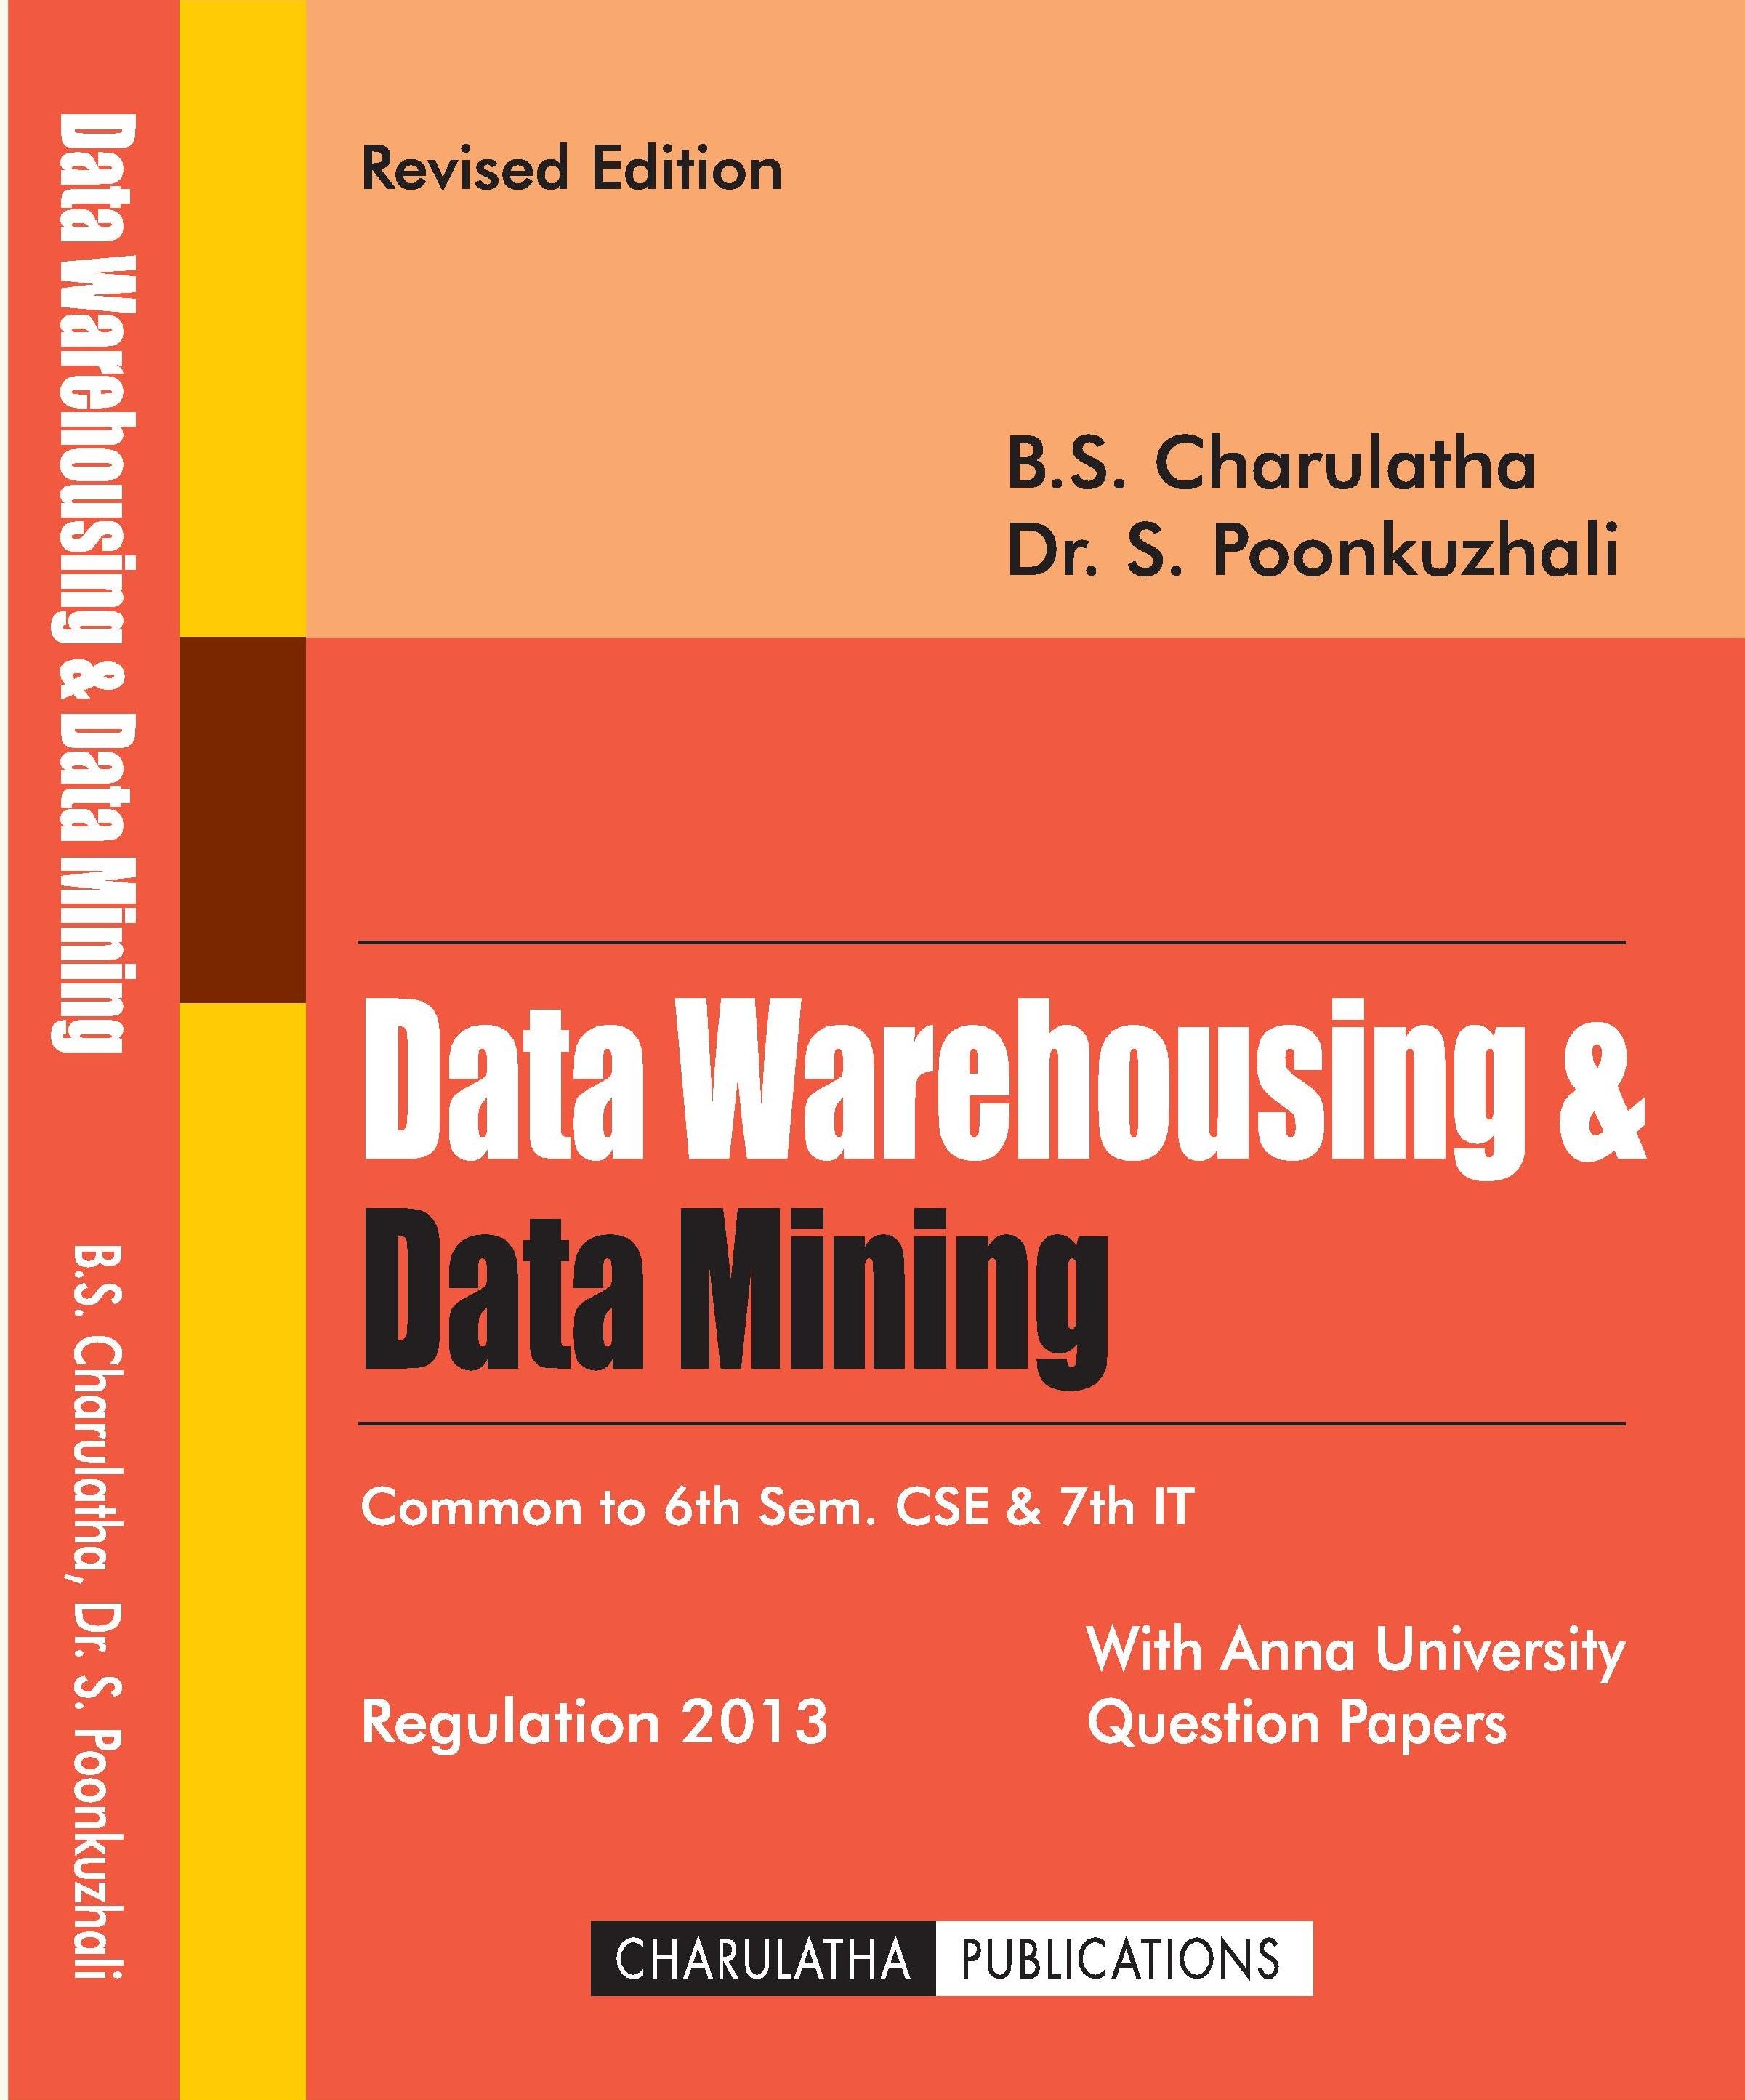 Charulatha Publications-Data Mining & Data Warehousing